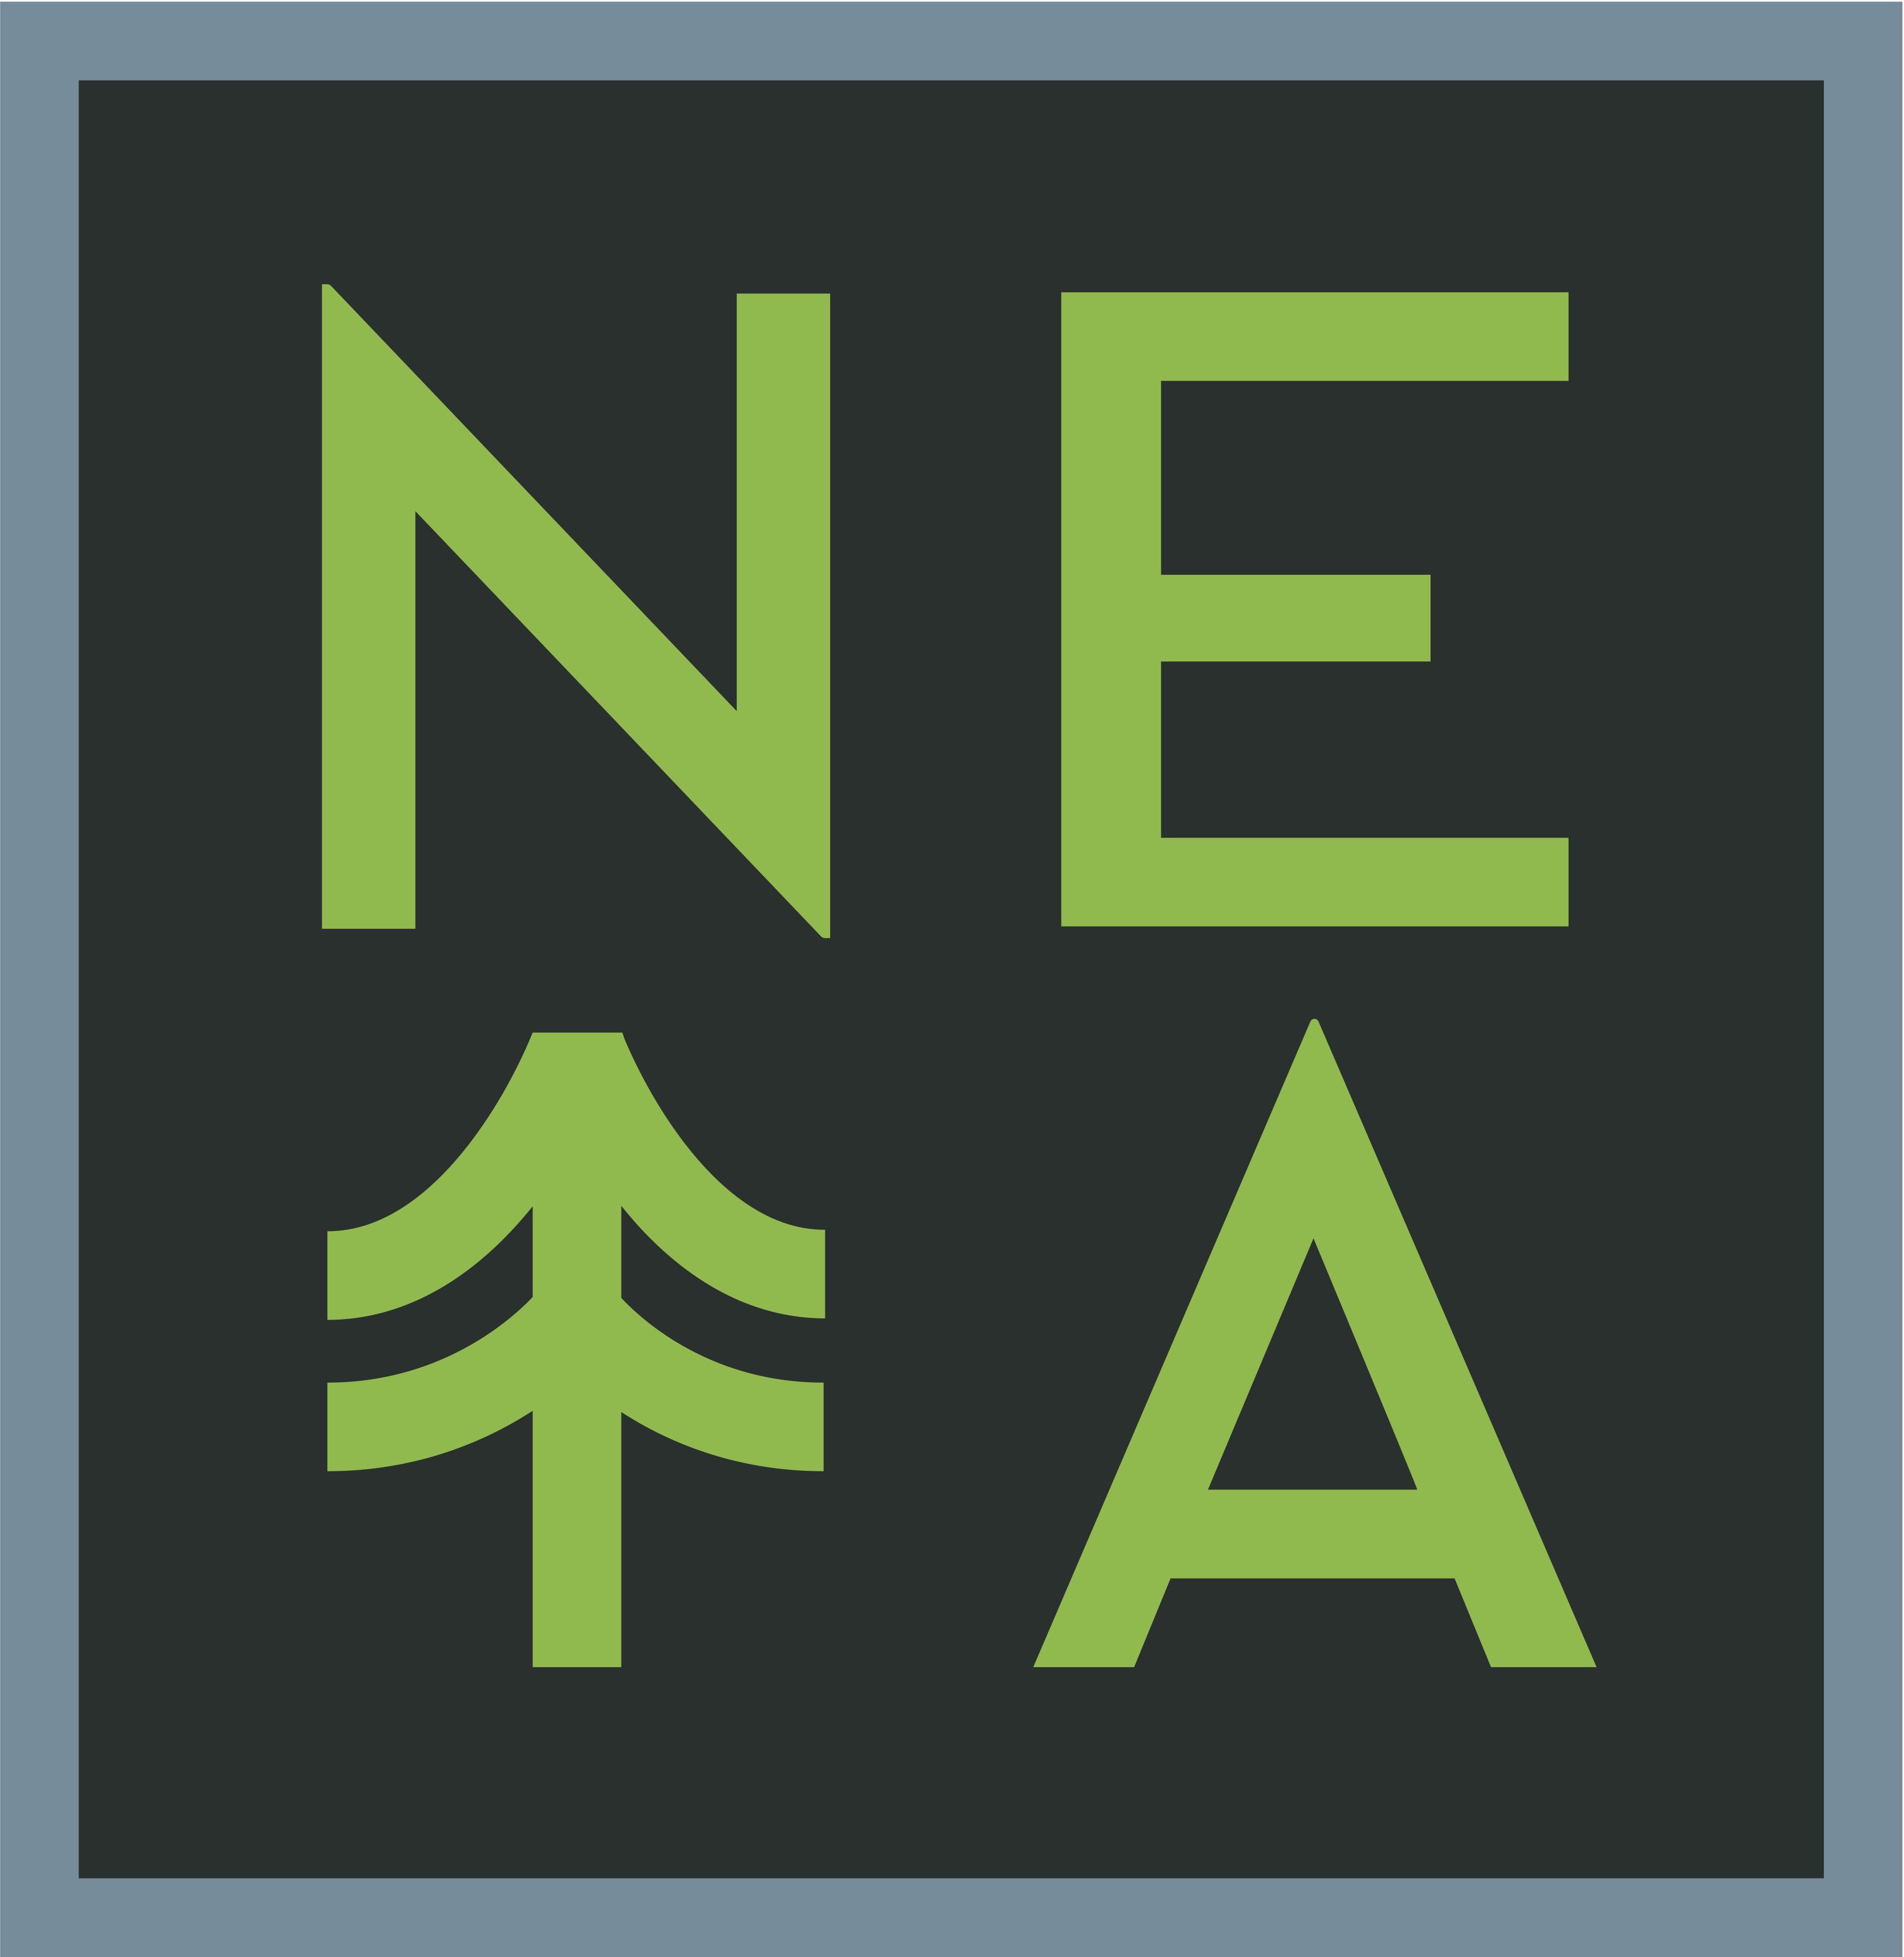 New England Treatment Access, Inc. (NETA)